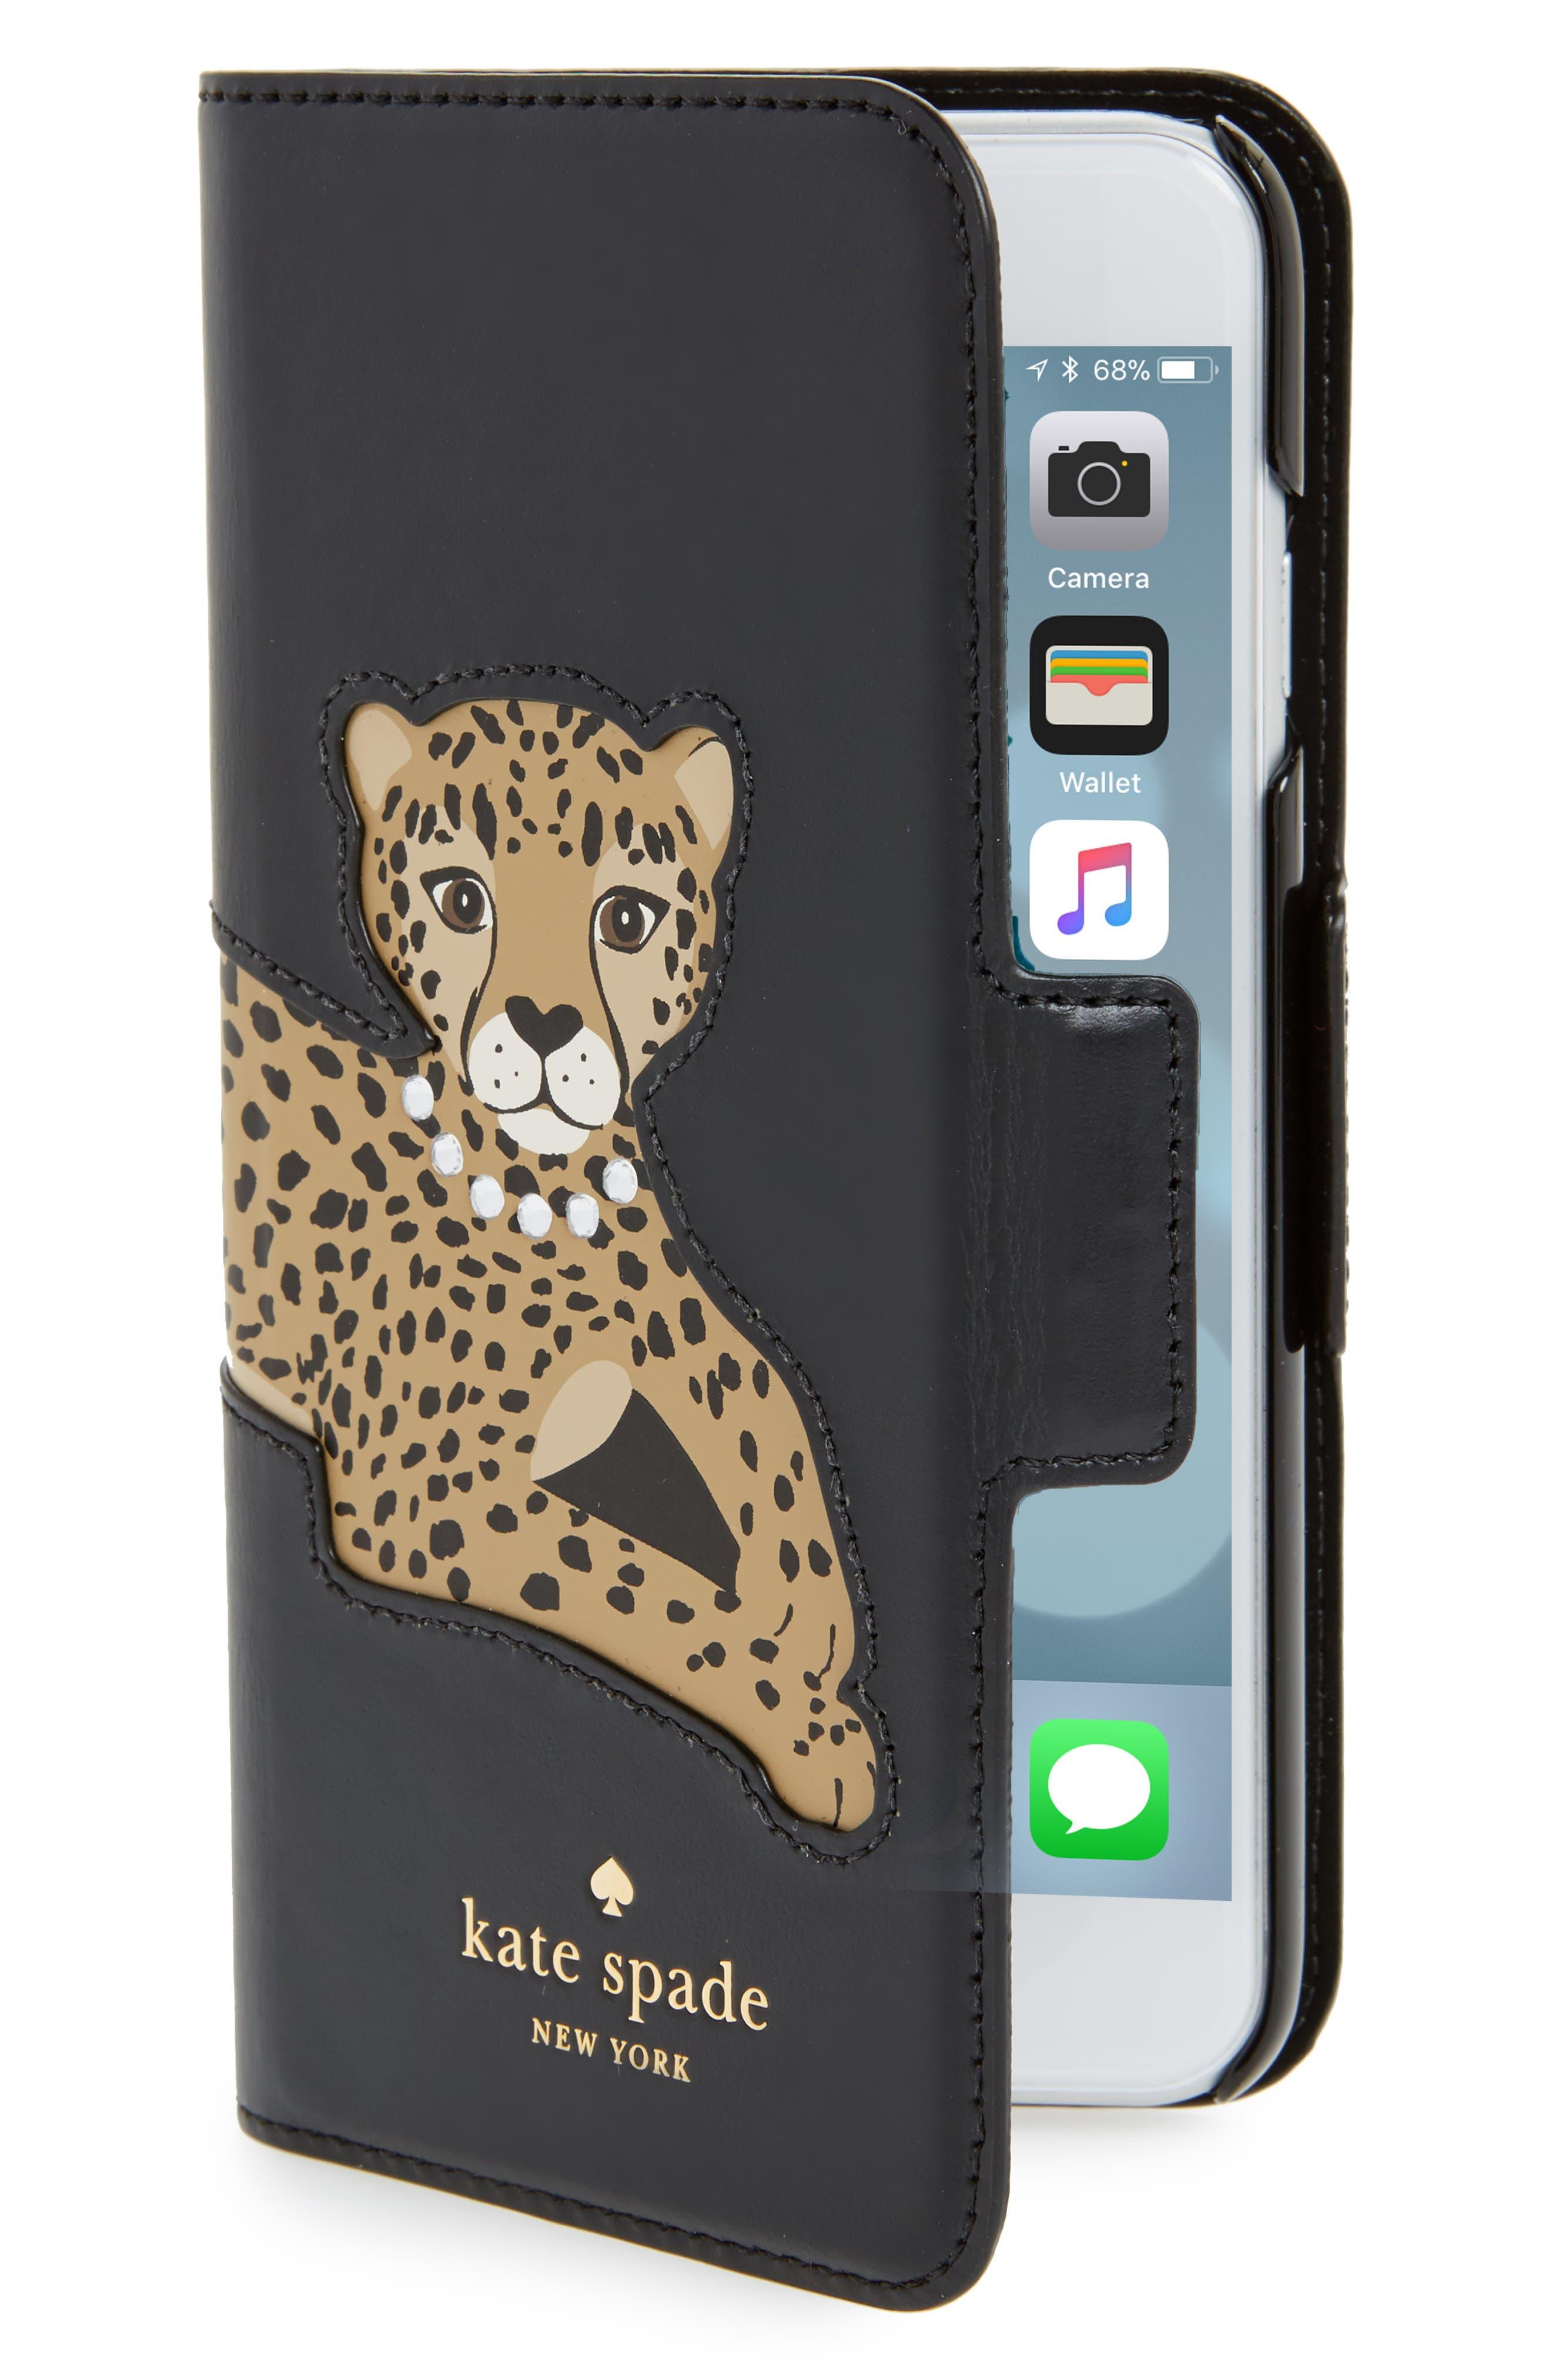 kate spade new york cheetah appliqué iPhone 7/8 folio case